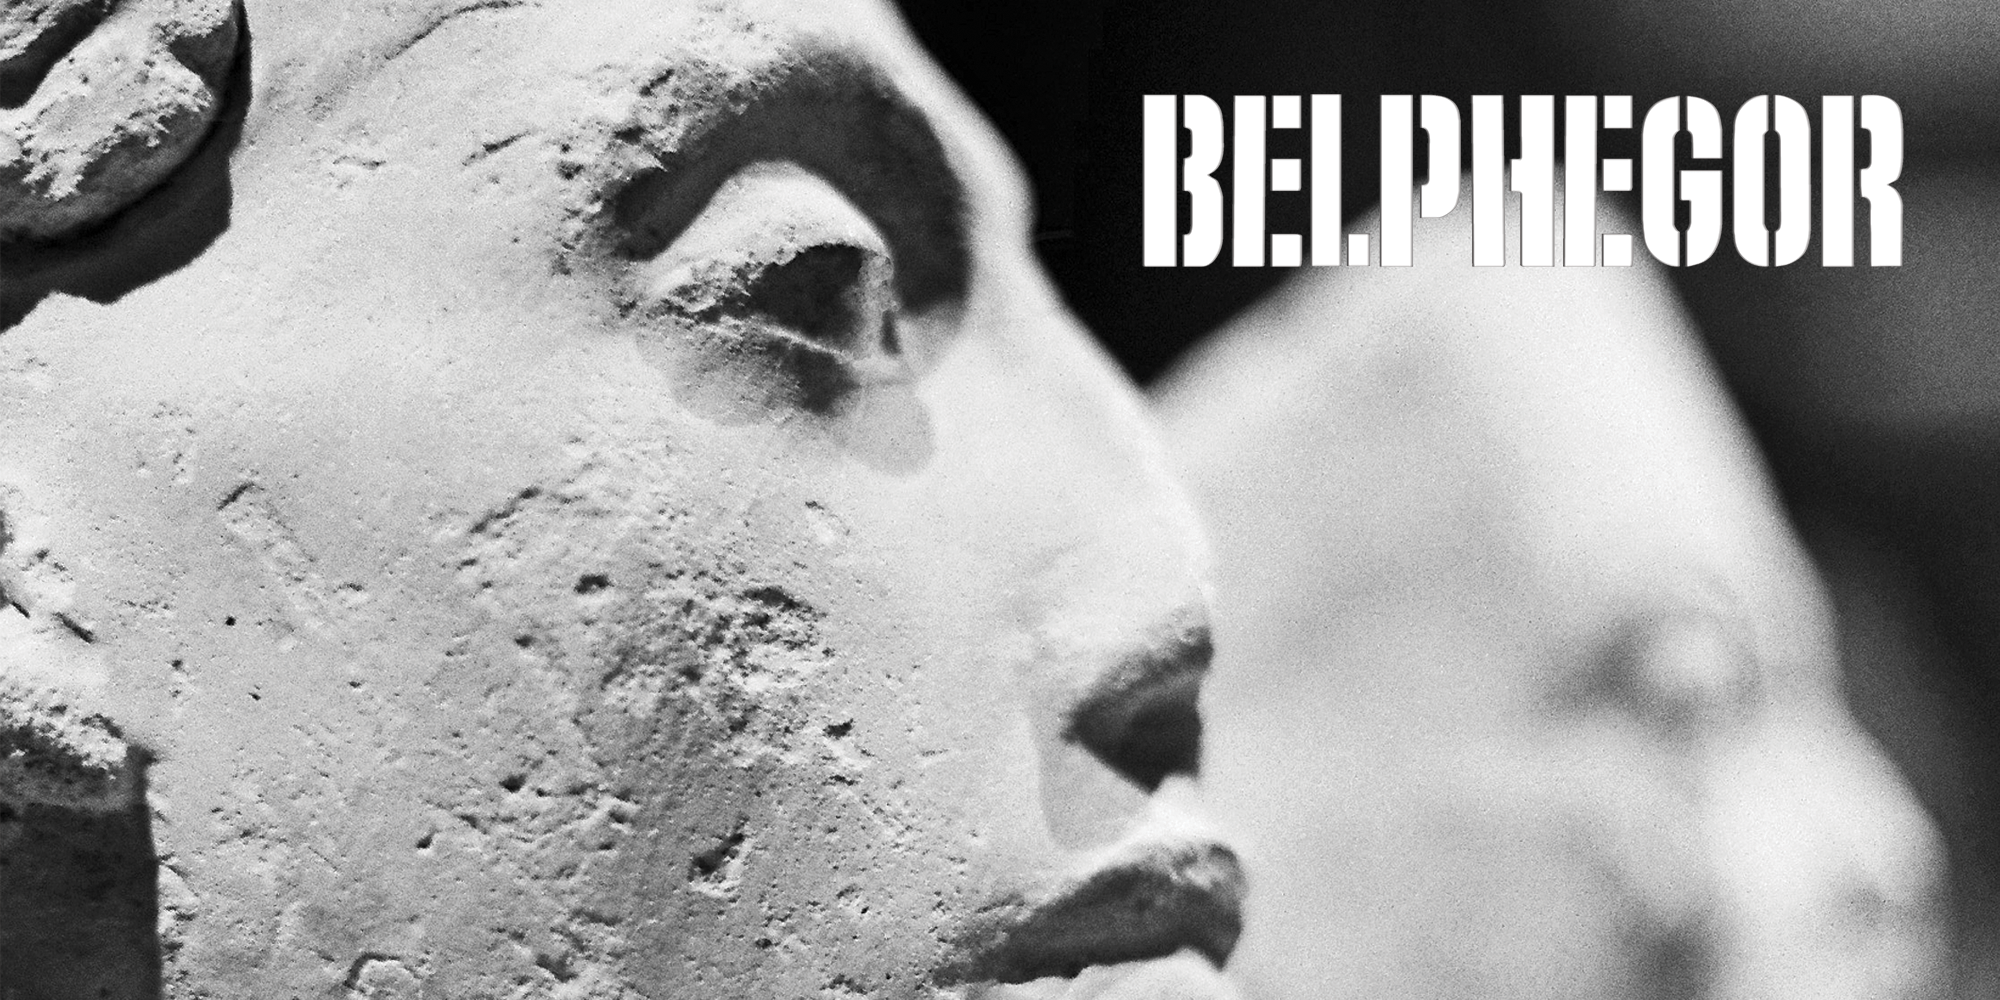 Belphegor expo Gilles Magin De natura rerum Arles 2018